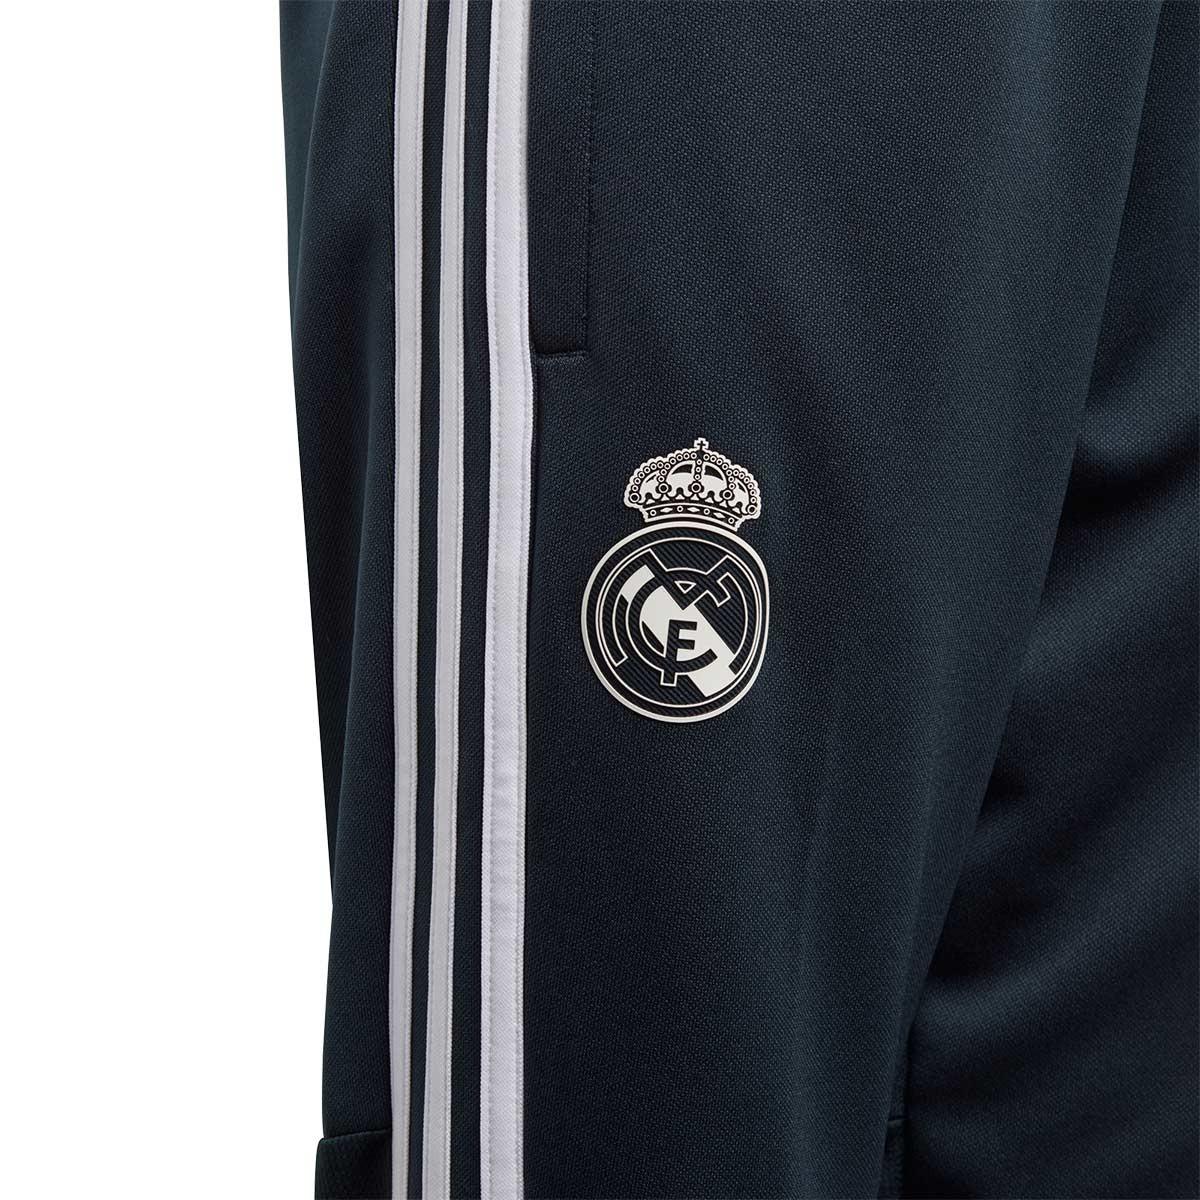 2019 Onix Largo Tech Adidas Pantalón Real Niño 2018 Madrid Training Y4gqwA